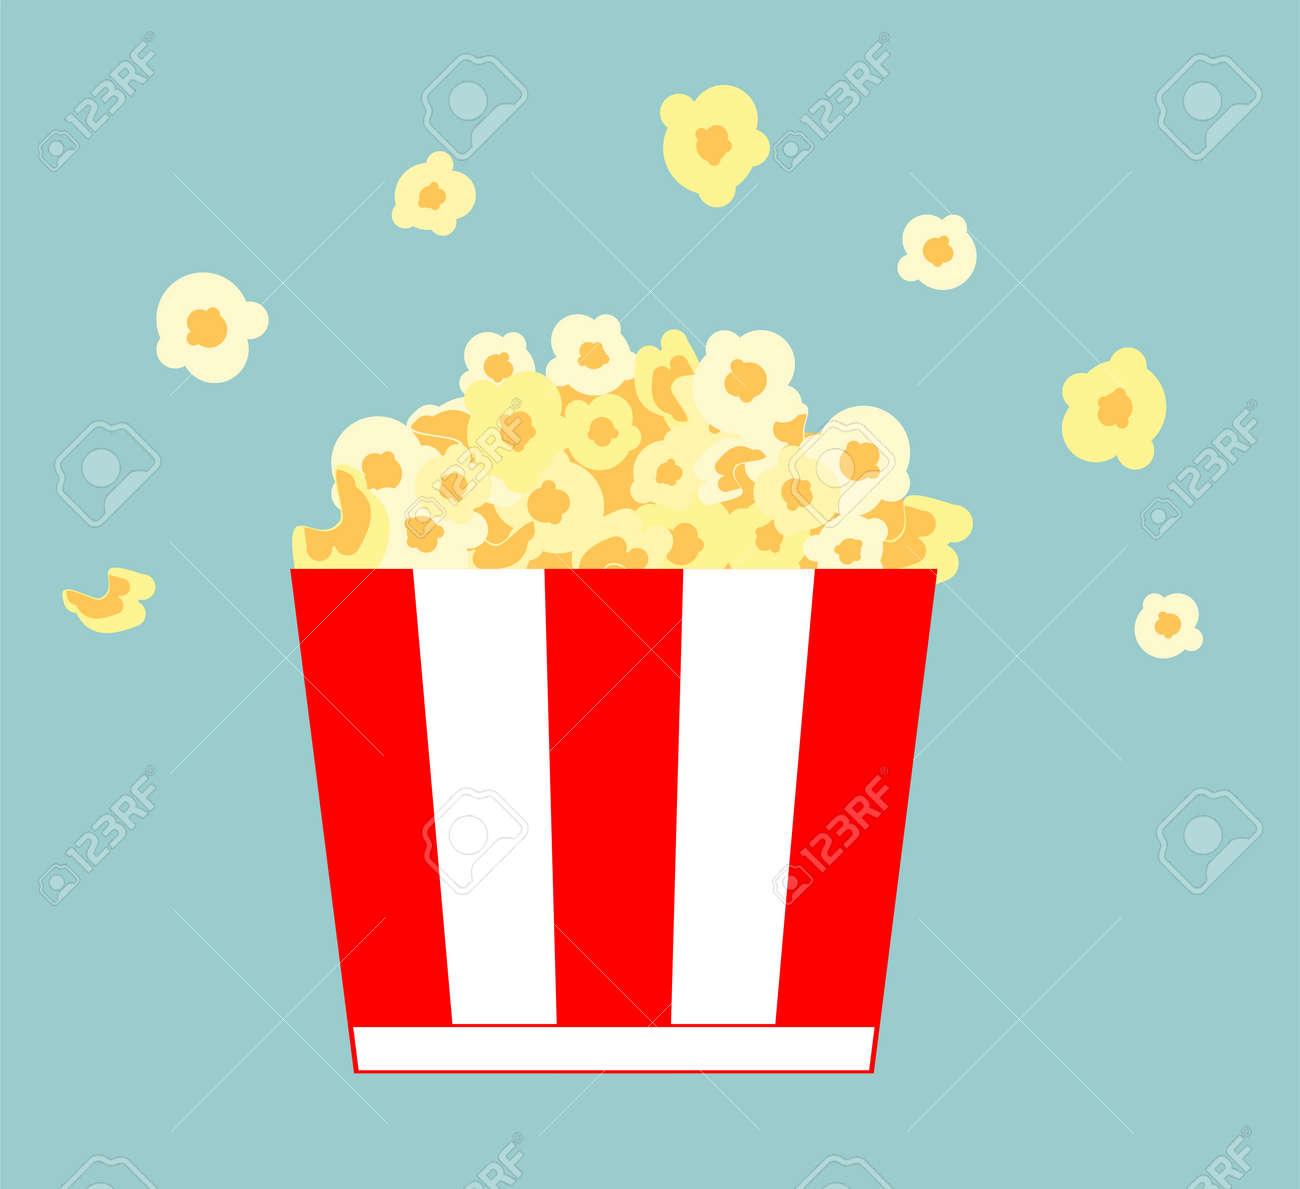 Popcorn bucket. Realistic illustration. Big portion popcorn. Cardboard or paper bucket. Cinema snack or movie food. Popcorn icon - 169650584